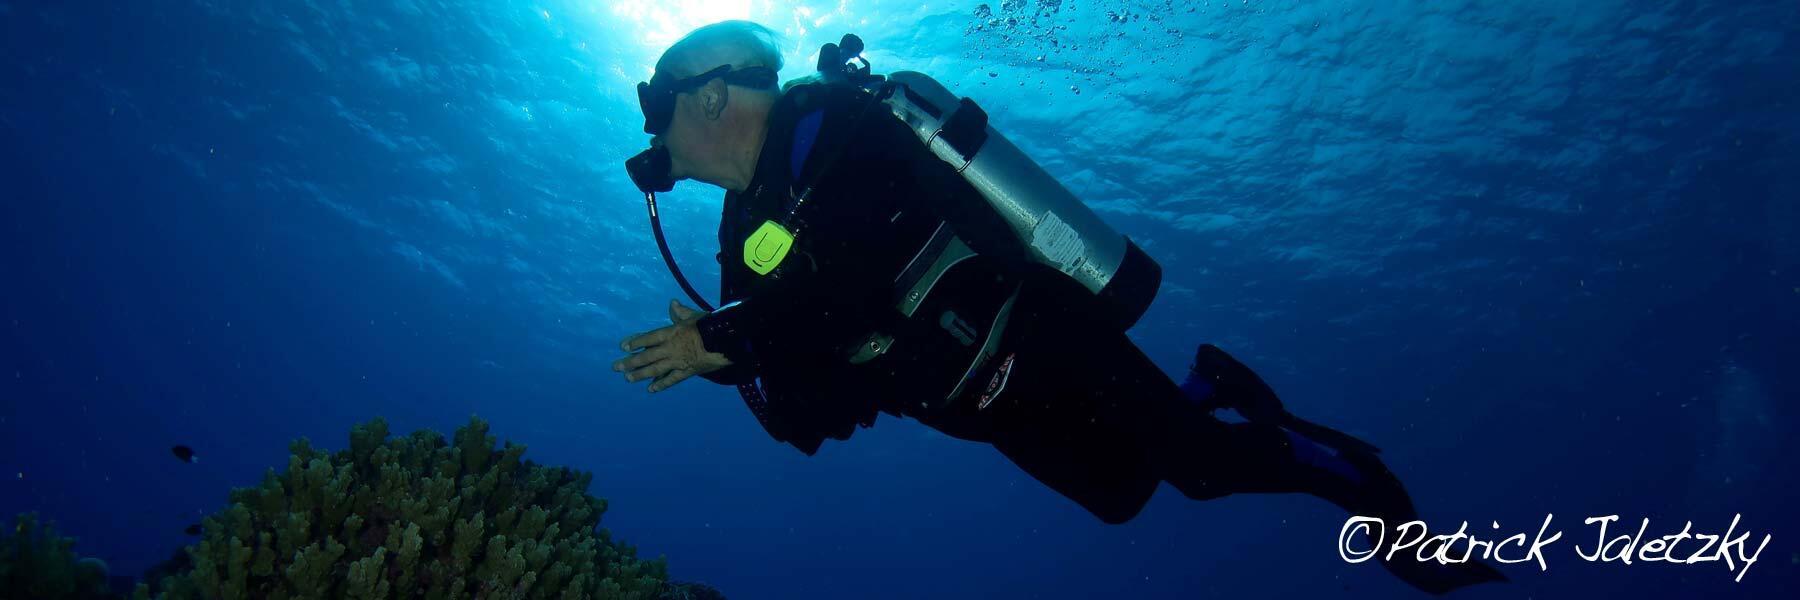 Scuba diver in Rarotonga, Cook Islands